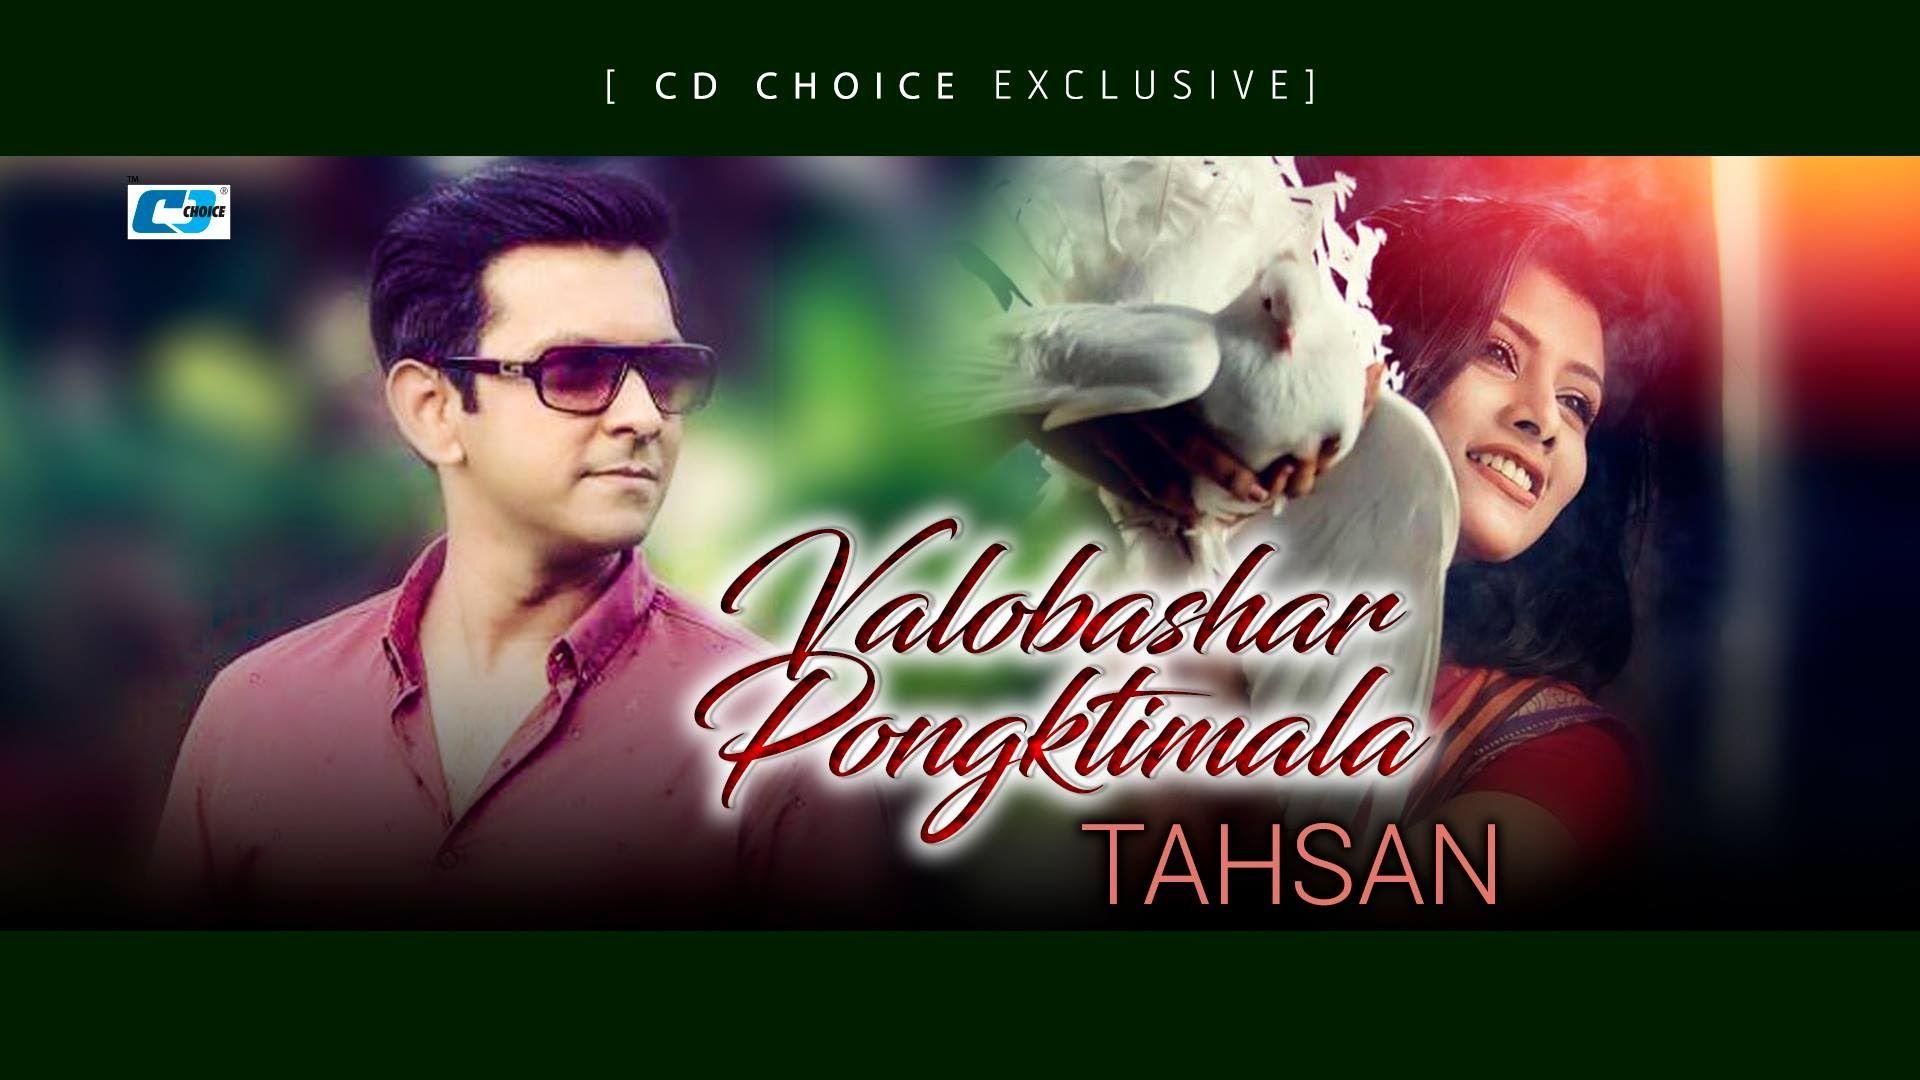 Valobashar Pongktimala Tahsan New Song Full Hd Songs News Songs Youtube Videos